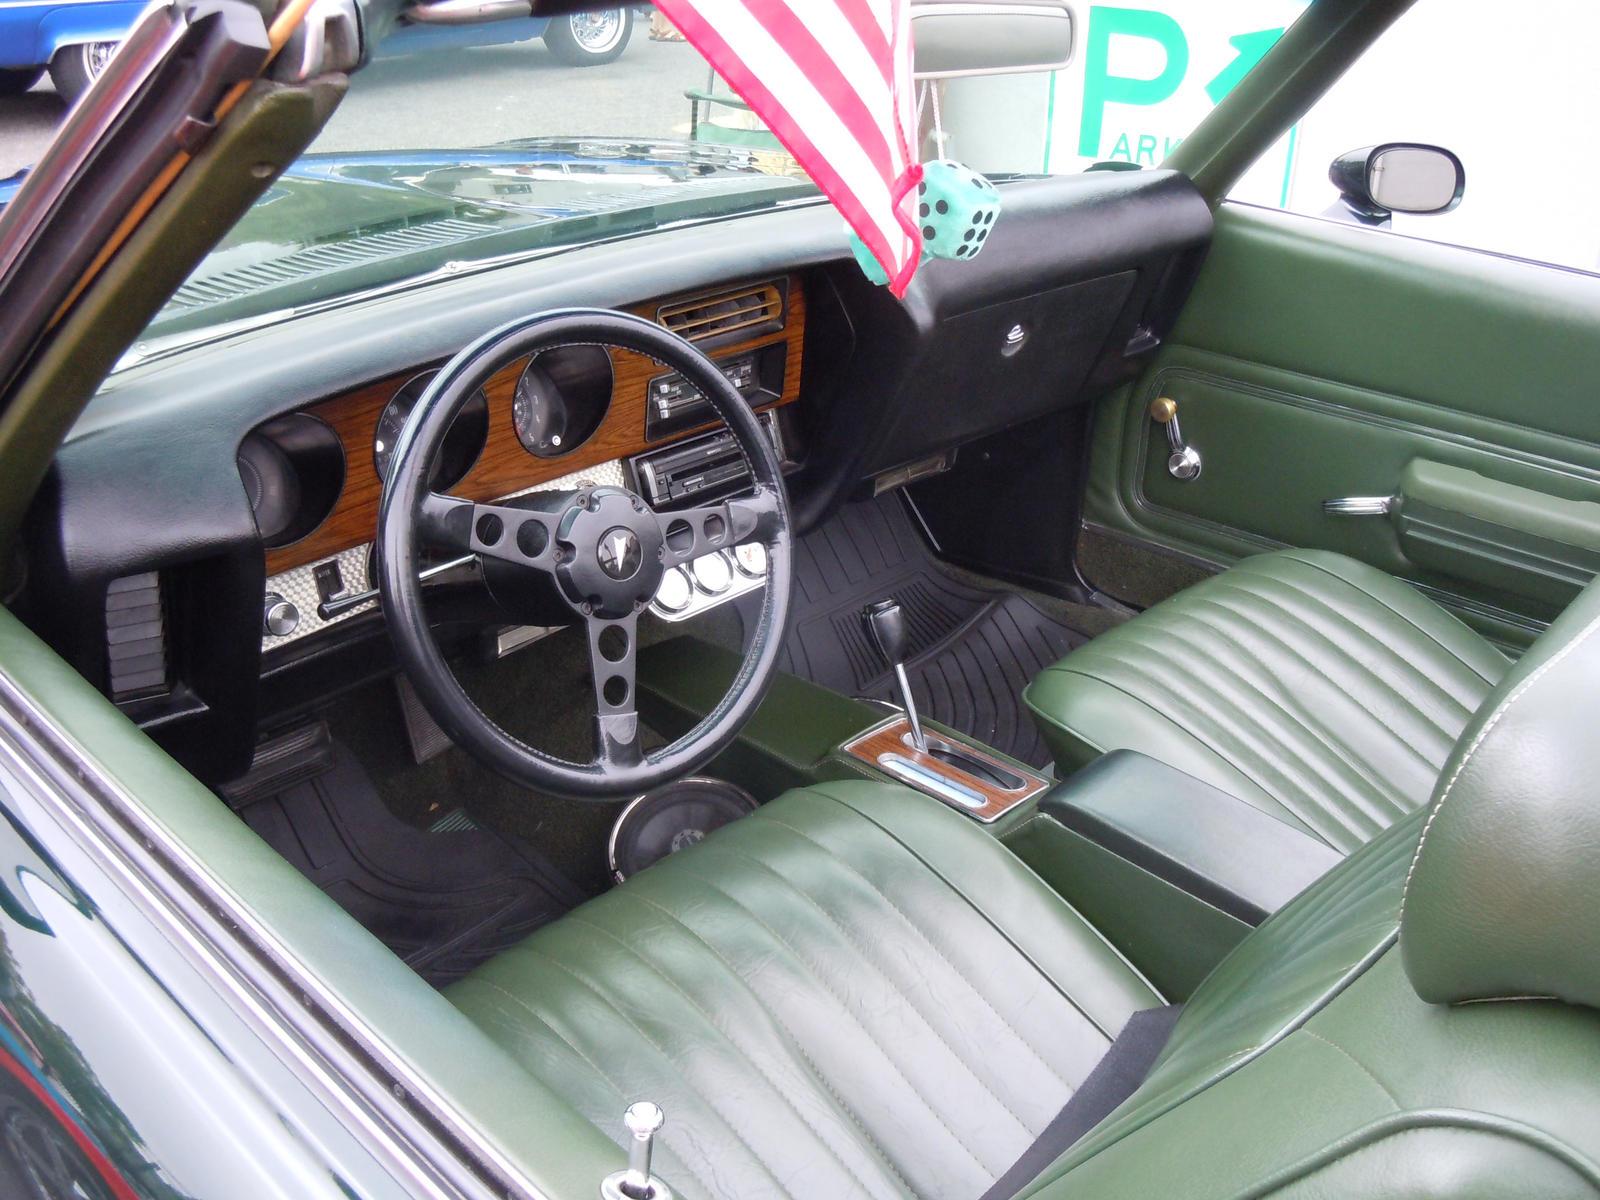 39 72 pontiac le mans sport convertible 400 interior by brooklyn47 on deviantart. Black Bedroom Furniture Sets. Home Design Ideas